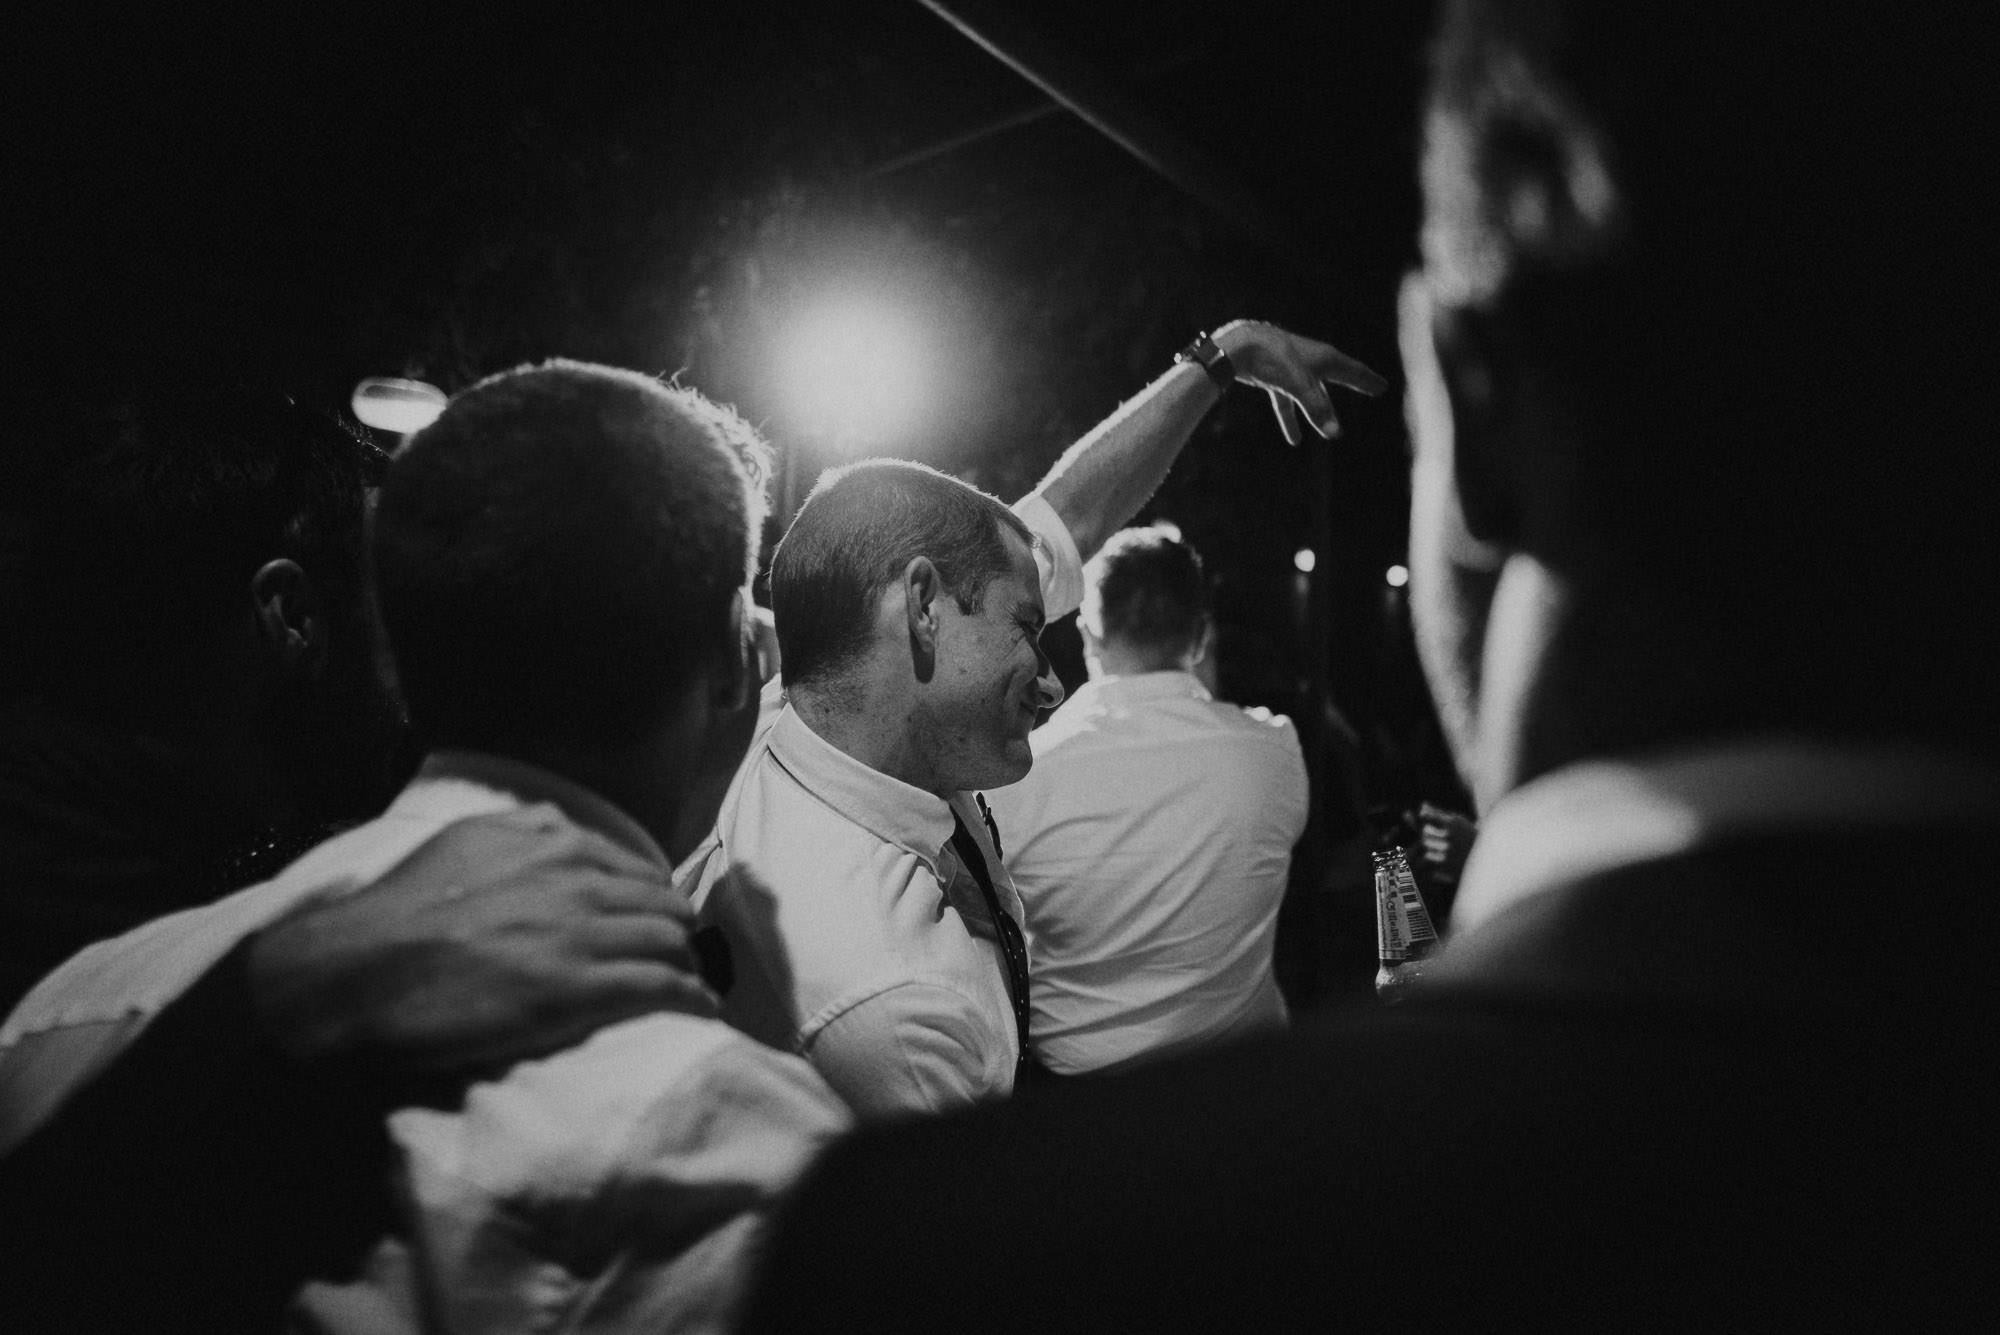 dubrovnik_croatia_wedding_photographer-jere_satamo-destination_weddings-095-web.jpg